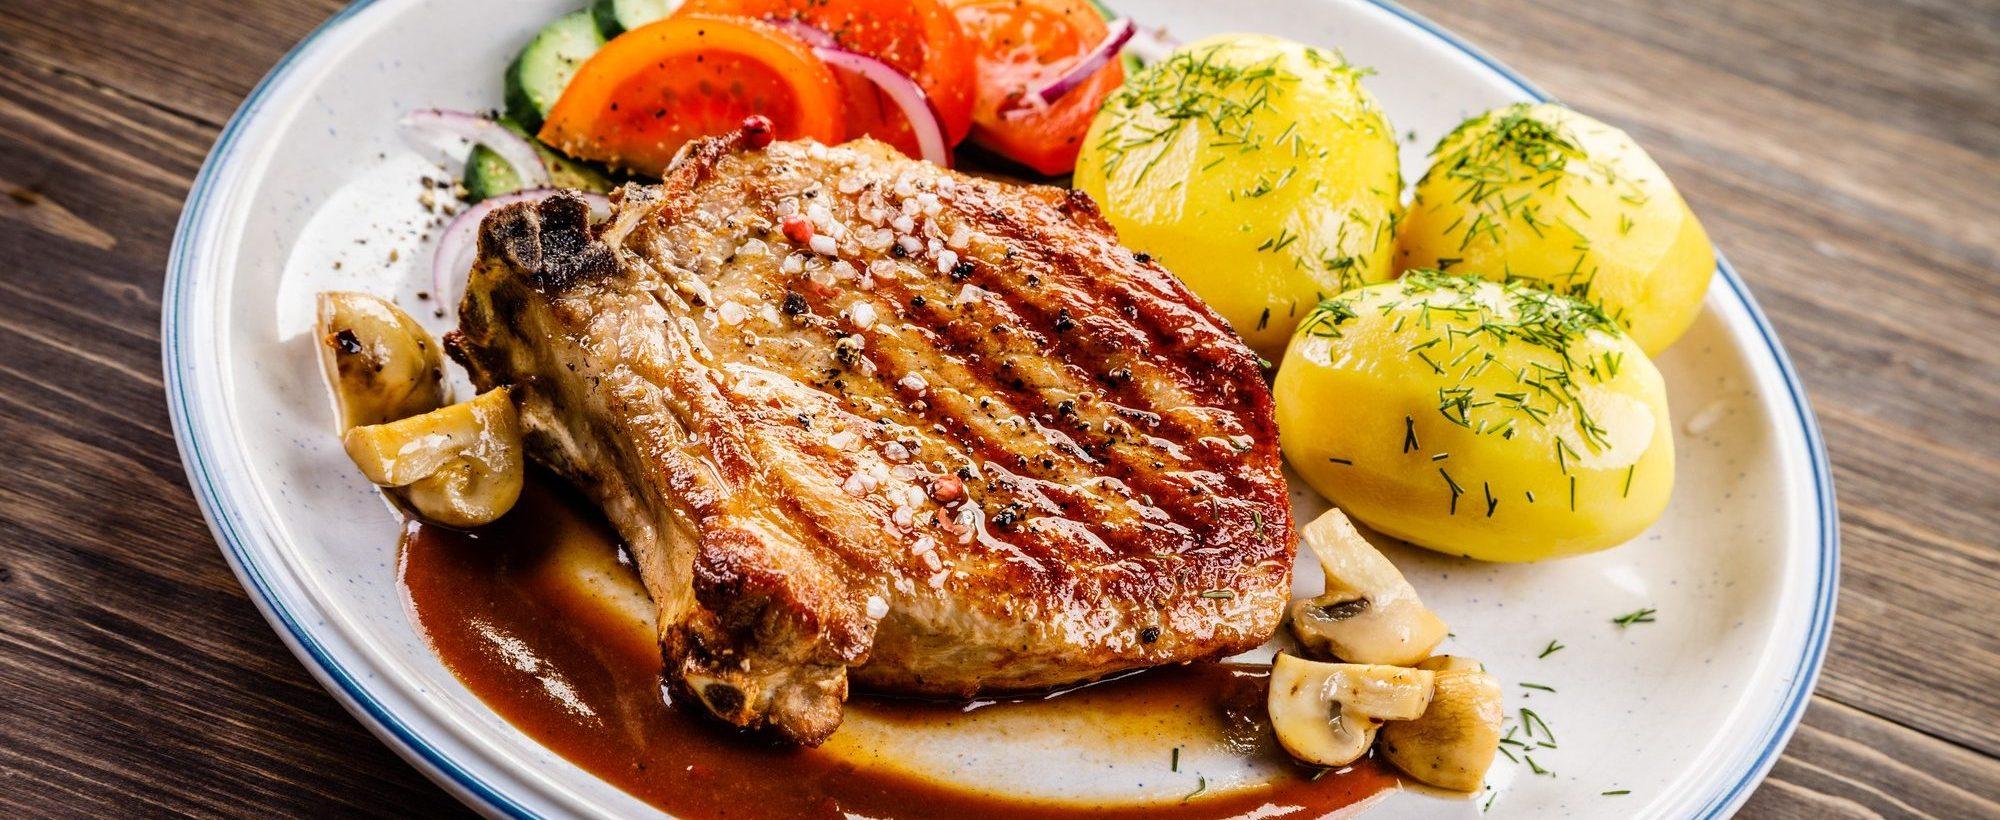 Slow Cooker Milo's Famous Sweet Tea Pork Chops and Gravy